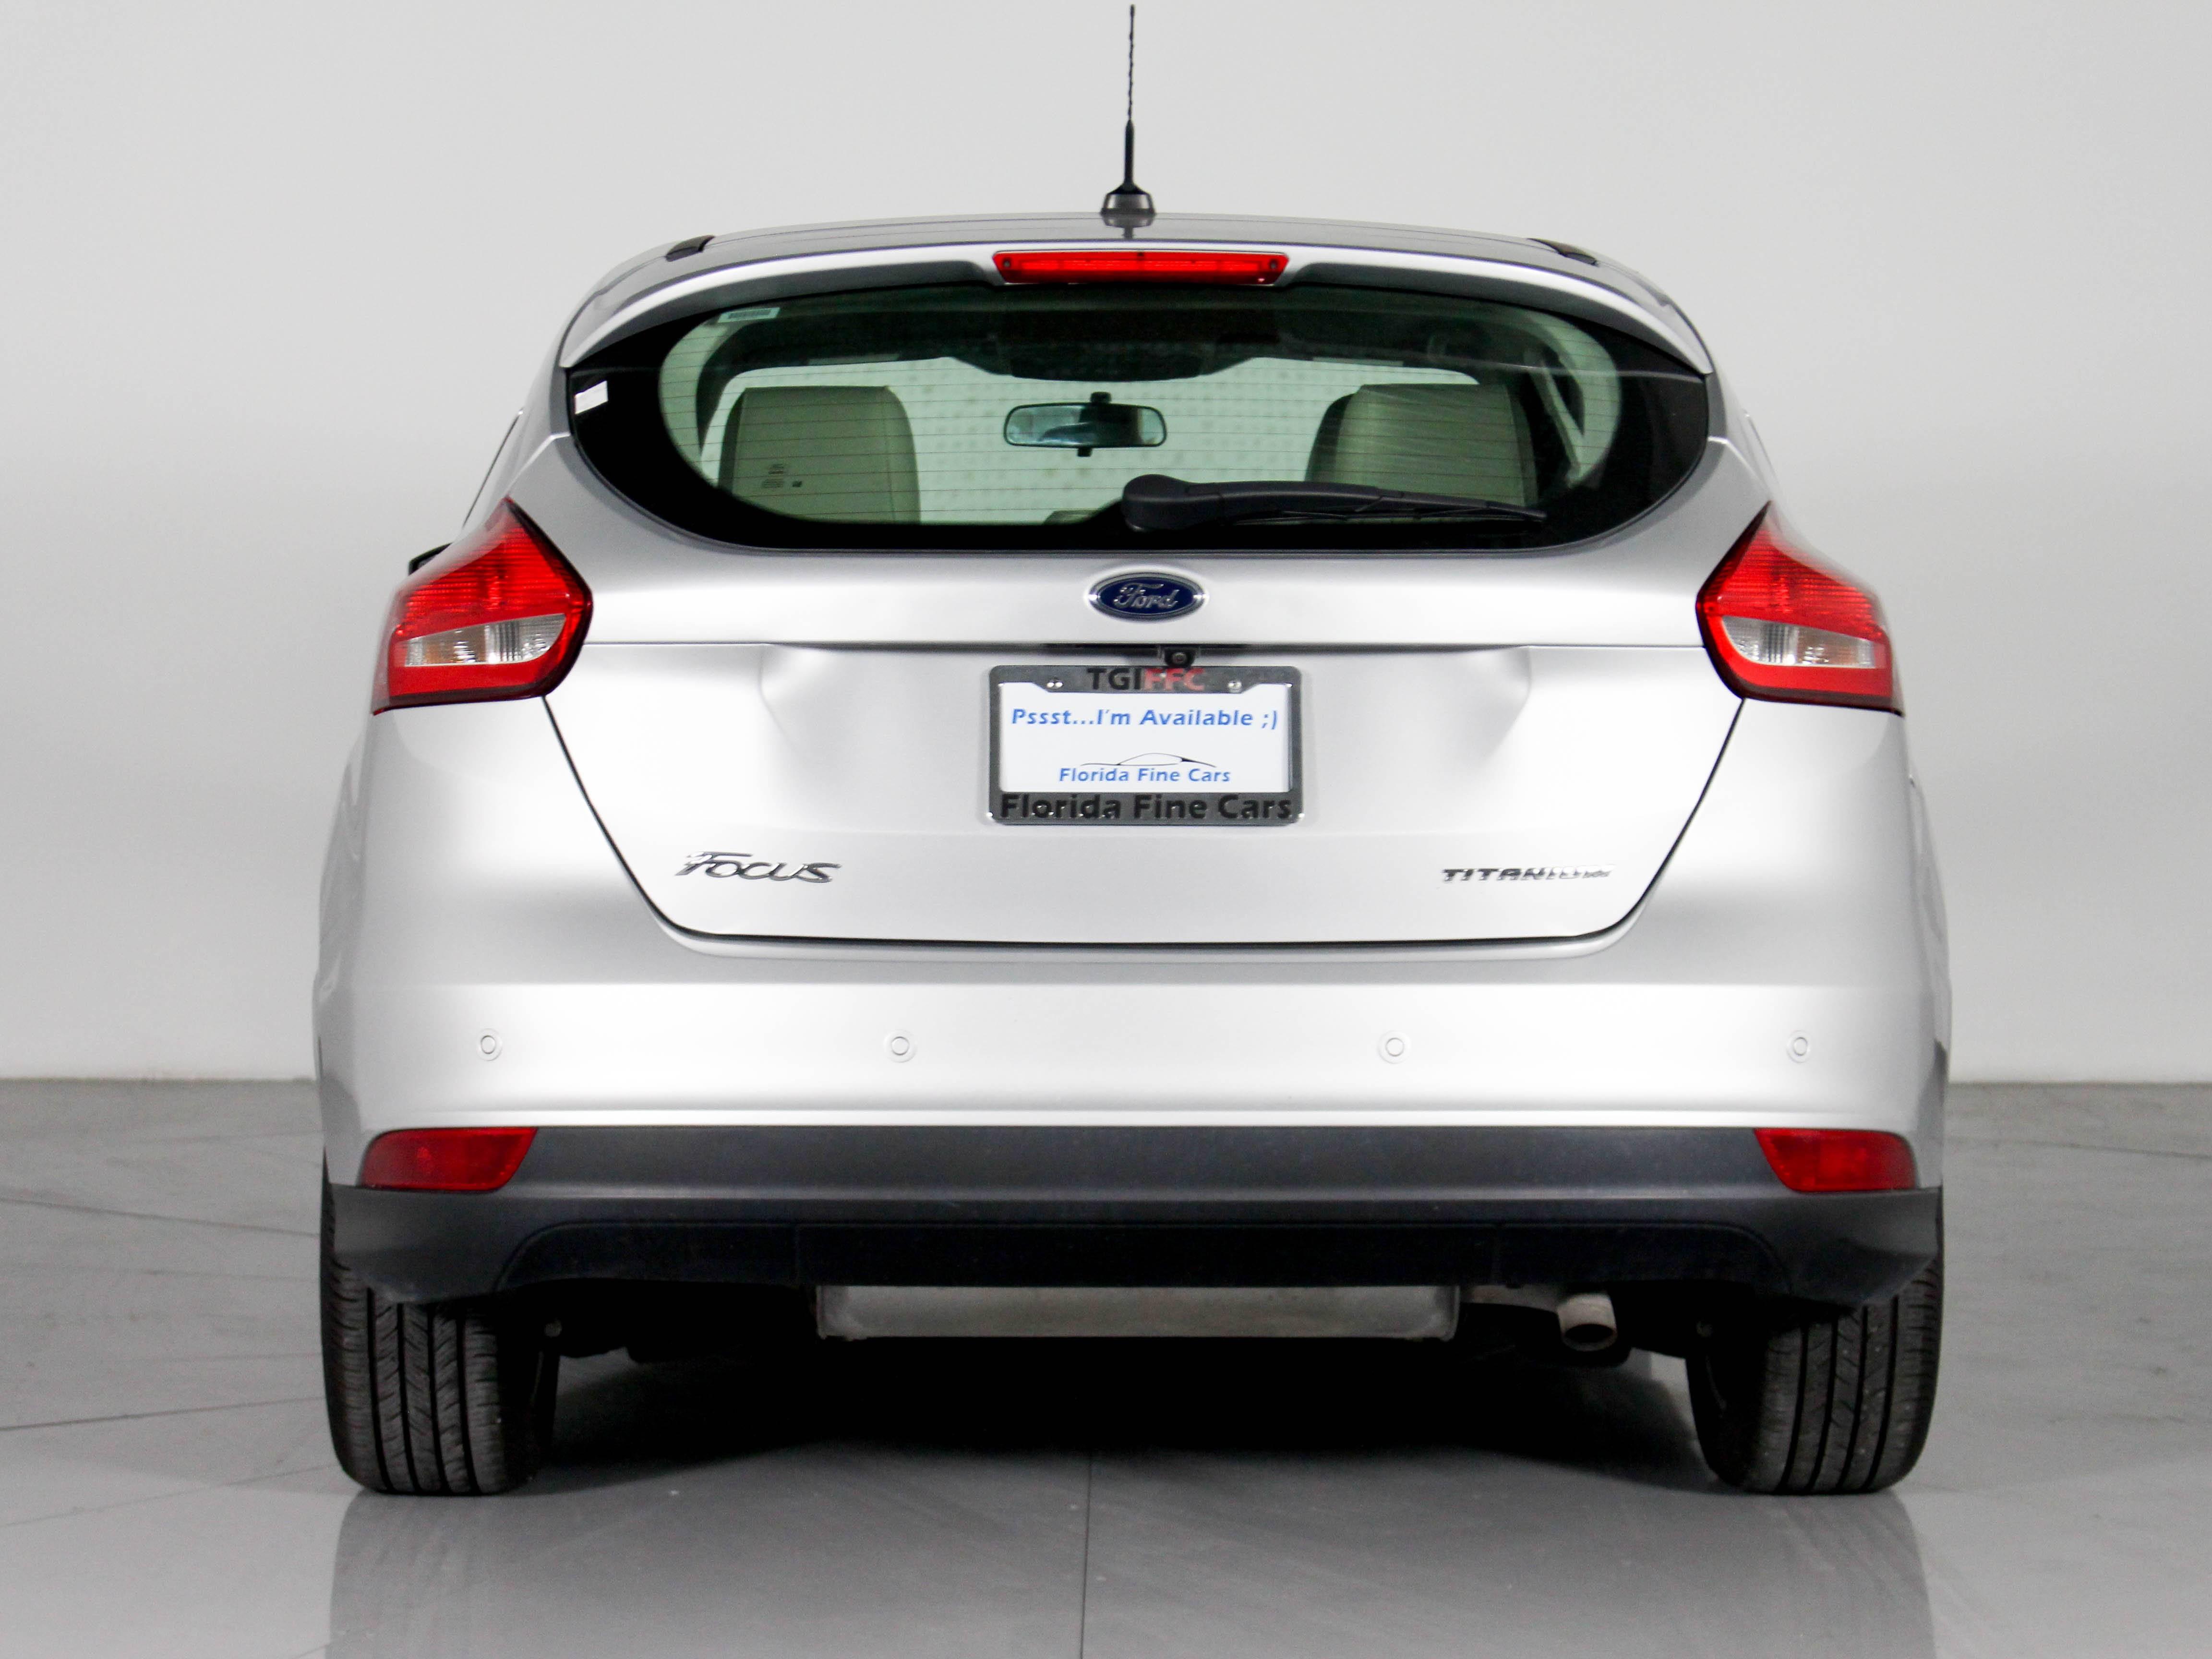 Used 2017 Ford Focus Anium Wagon For In Miami Fl 98079 Florida Fine Cars